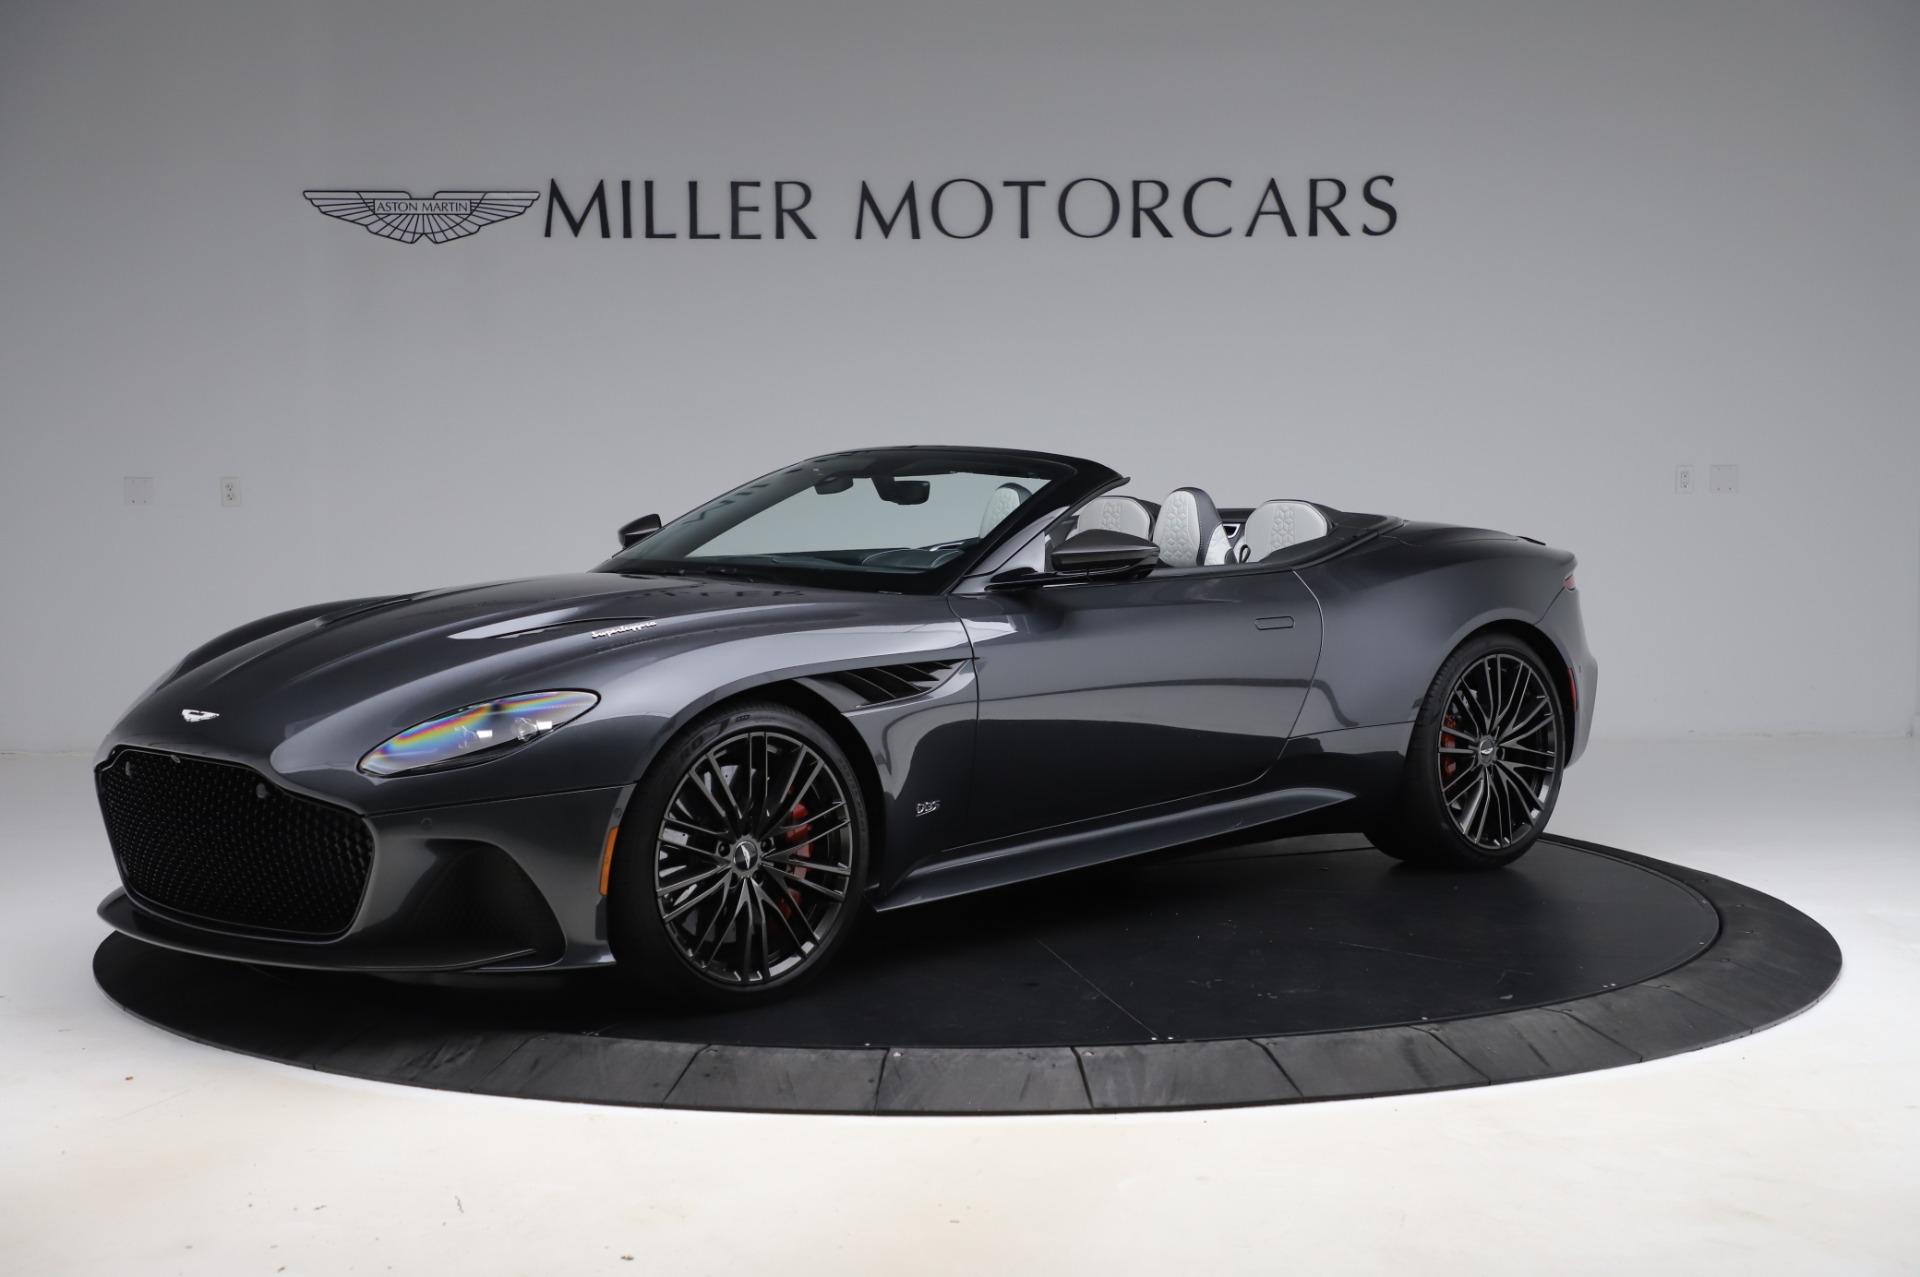 Used 2020 Aston Martin DBS Superleggera Volante for sale Sold at Maserati of Westport in Westport CT 06880 1